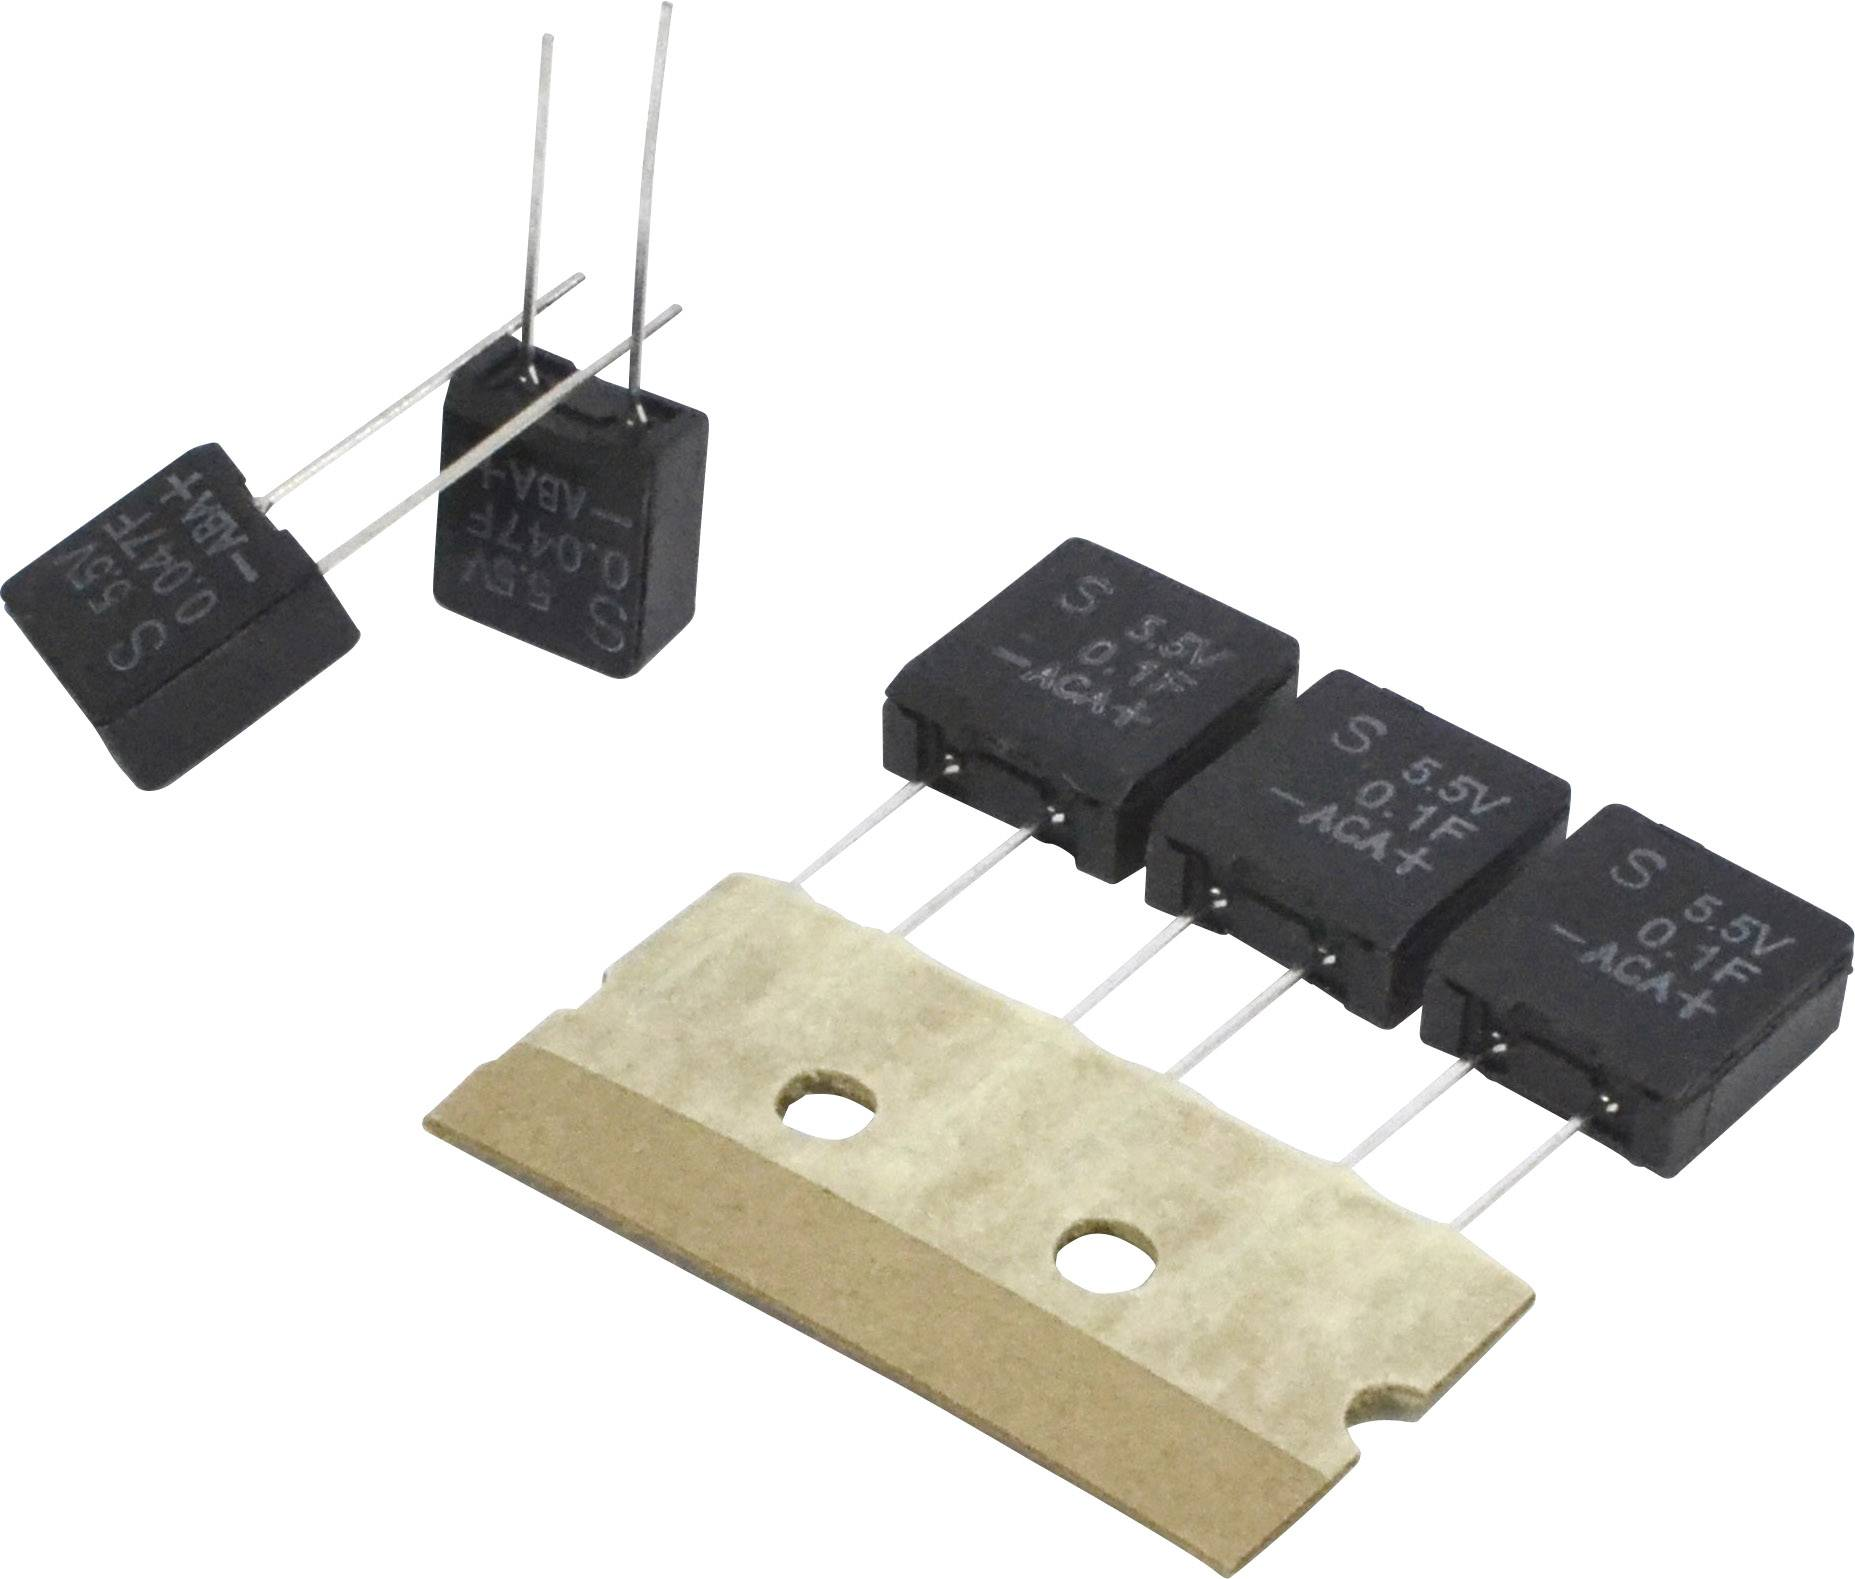 Dvouvrstvý kondenzátor Korchip DA5R5473AF, 0.047 F, 5.5 V, (d x š x v) 5.0 x 9.5 x 10.5 mm, 1 ks